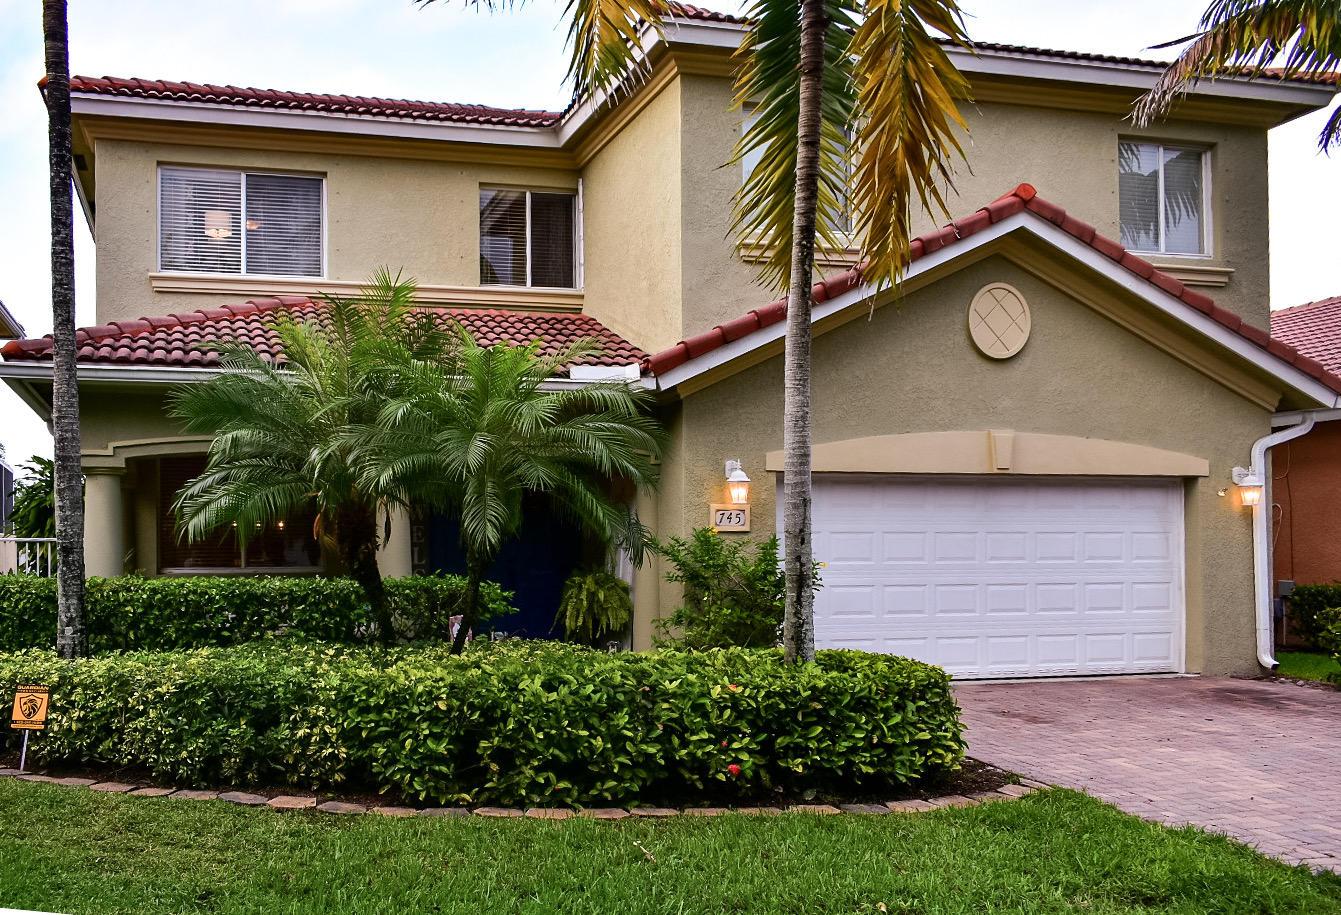 745 Gazetta Way West Palm Beach, FL 33413